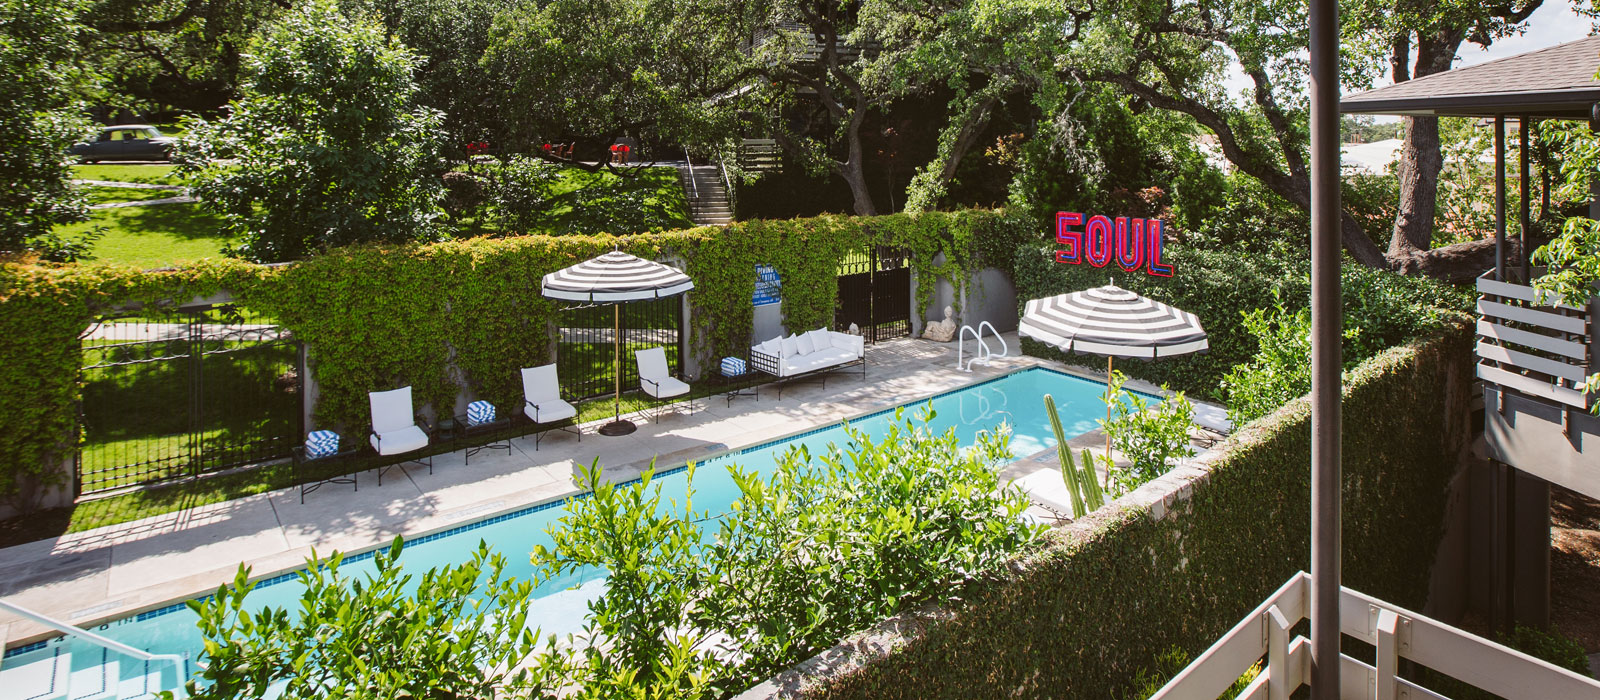 16 poolside bungalow suite Hotel Saint Cecilia Austin Texas interior design vintage apartment ciekawe wnetrza hotelowe styl amerykanski